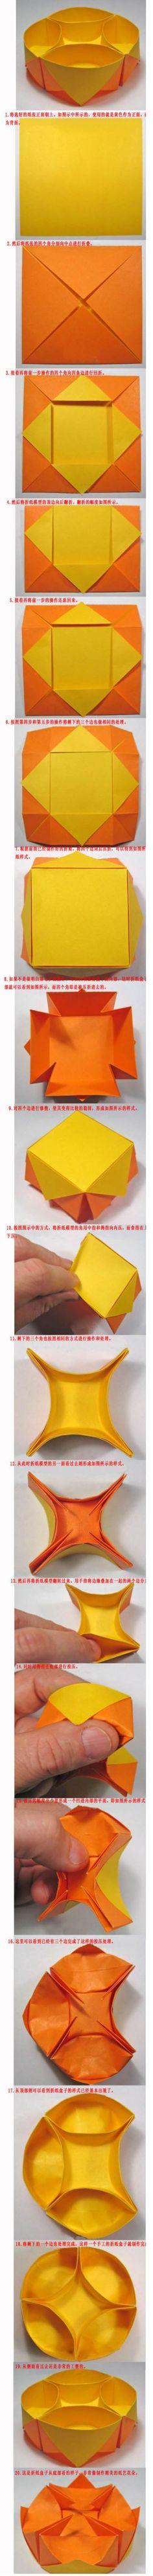 Curiosa caja de óvalos en origami // Curious origami box